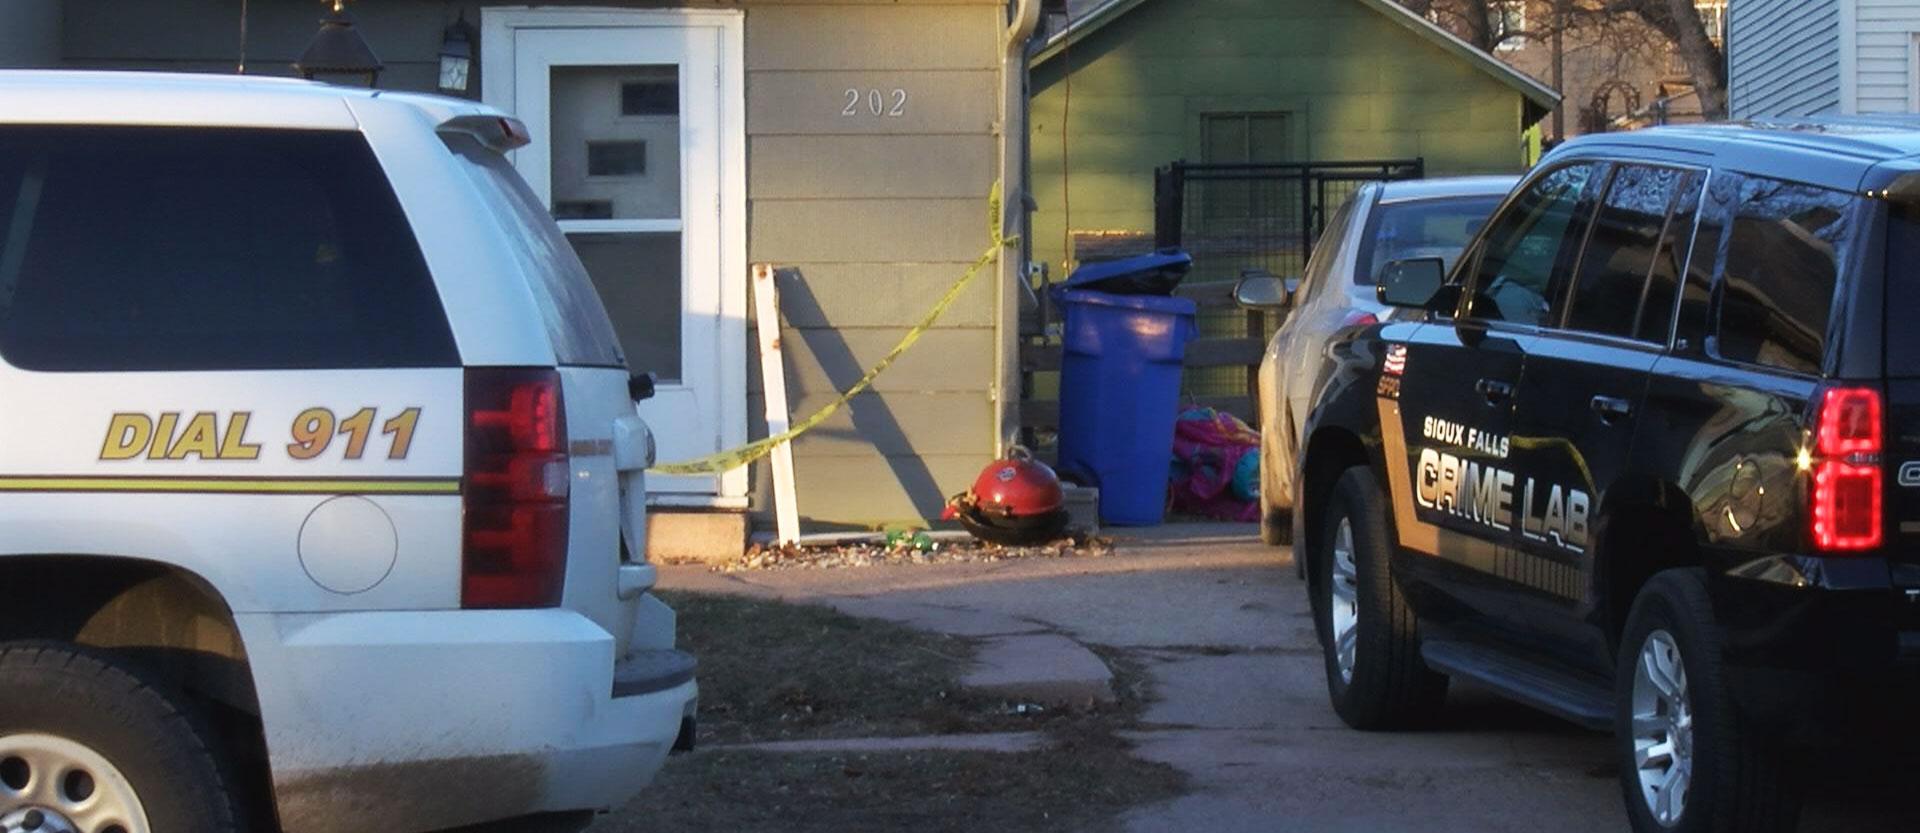 news sheriff office investigating suspicious death near delandstml